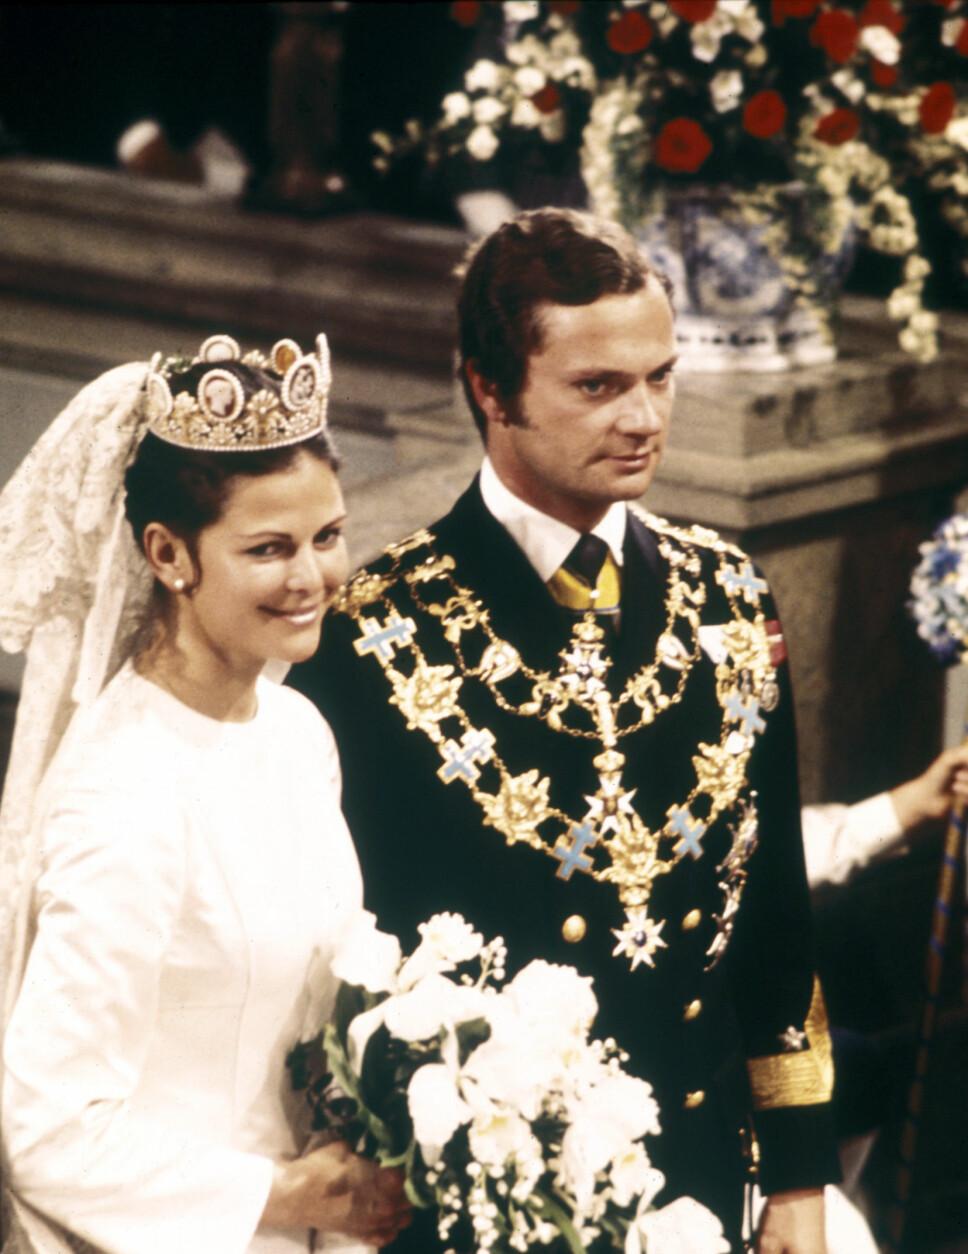 SAMME TIARA: Dronning Silvia bar den samme tiaraen som sin dattere da hun giftet seg med kong Carl Gustaf i 1976.